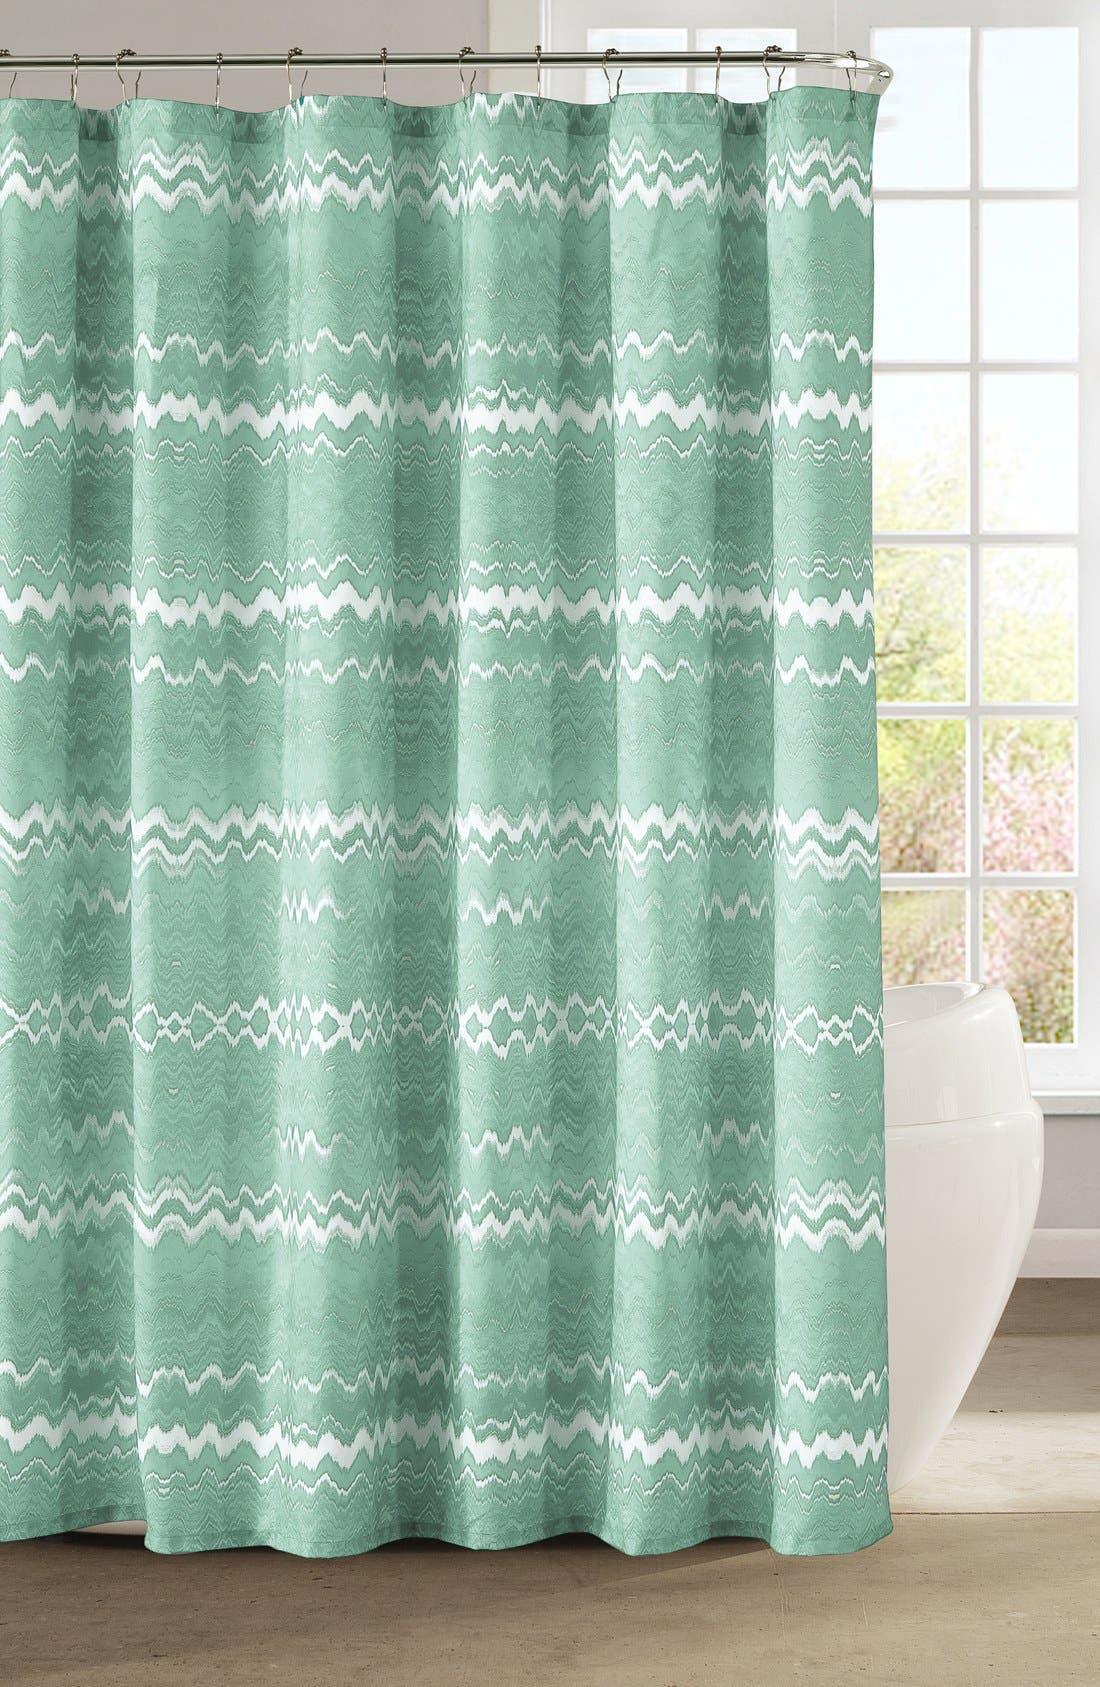 Alternate Image 1 Selected - kensie 'Mikaela' Shower Curtain